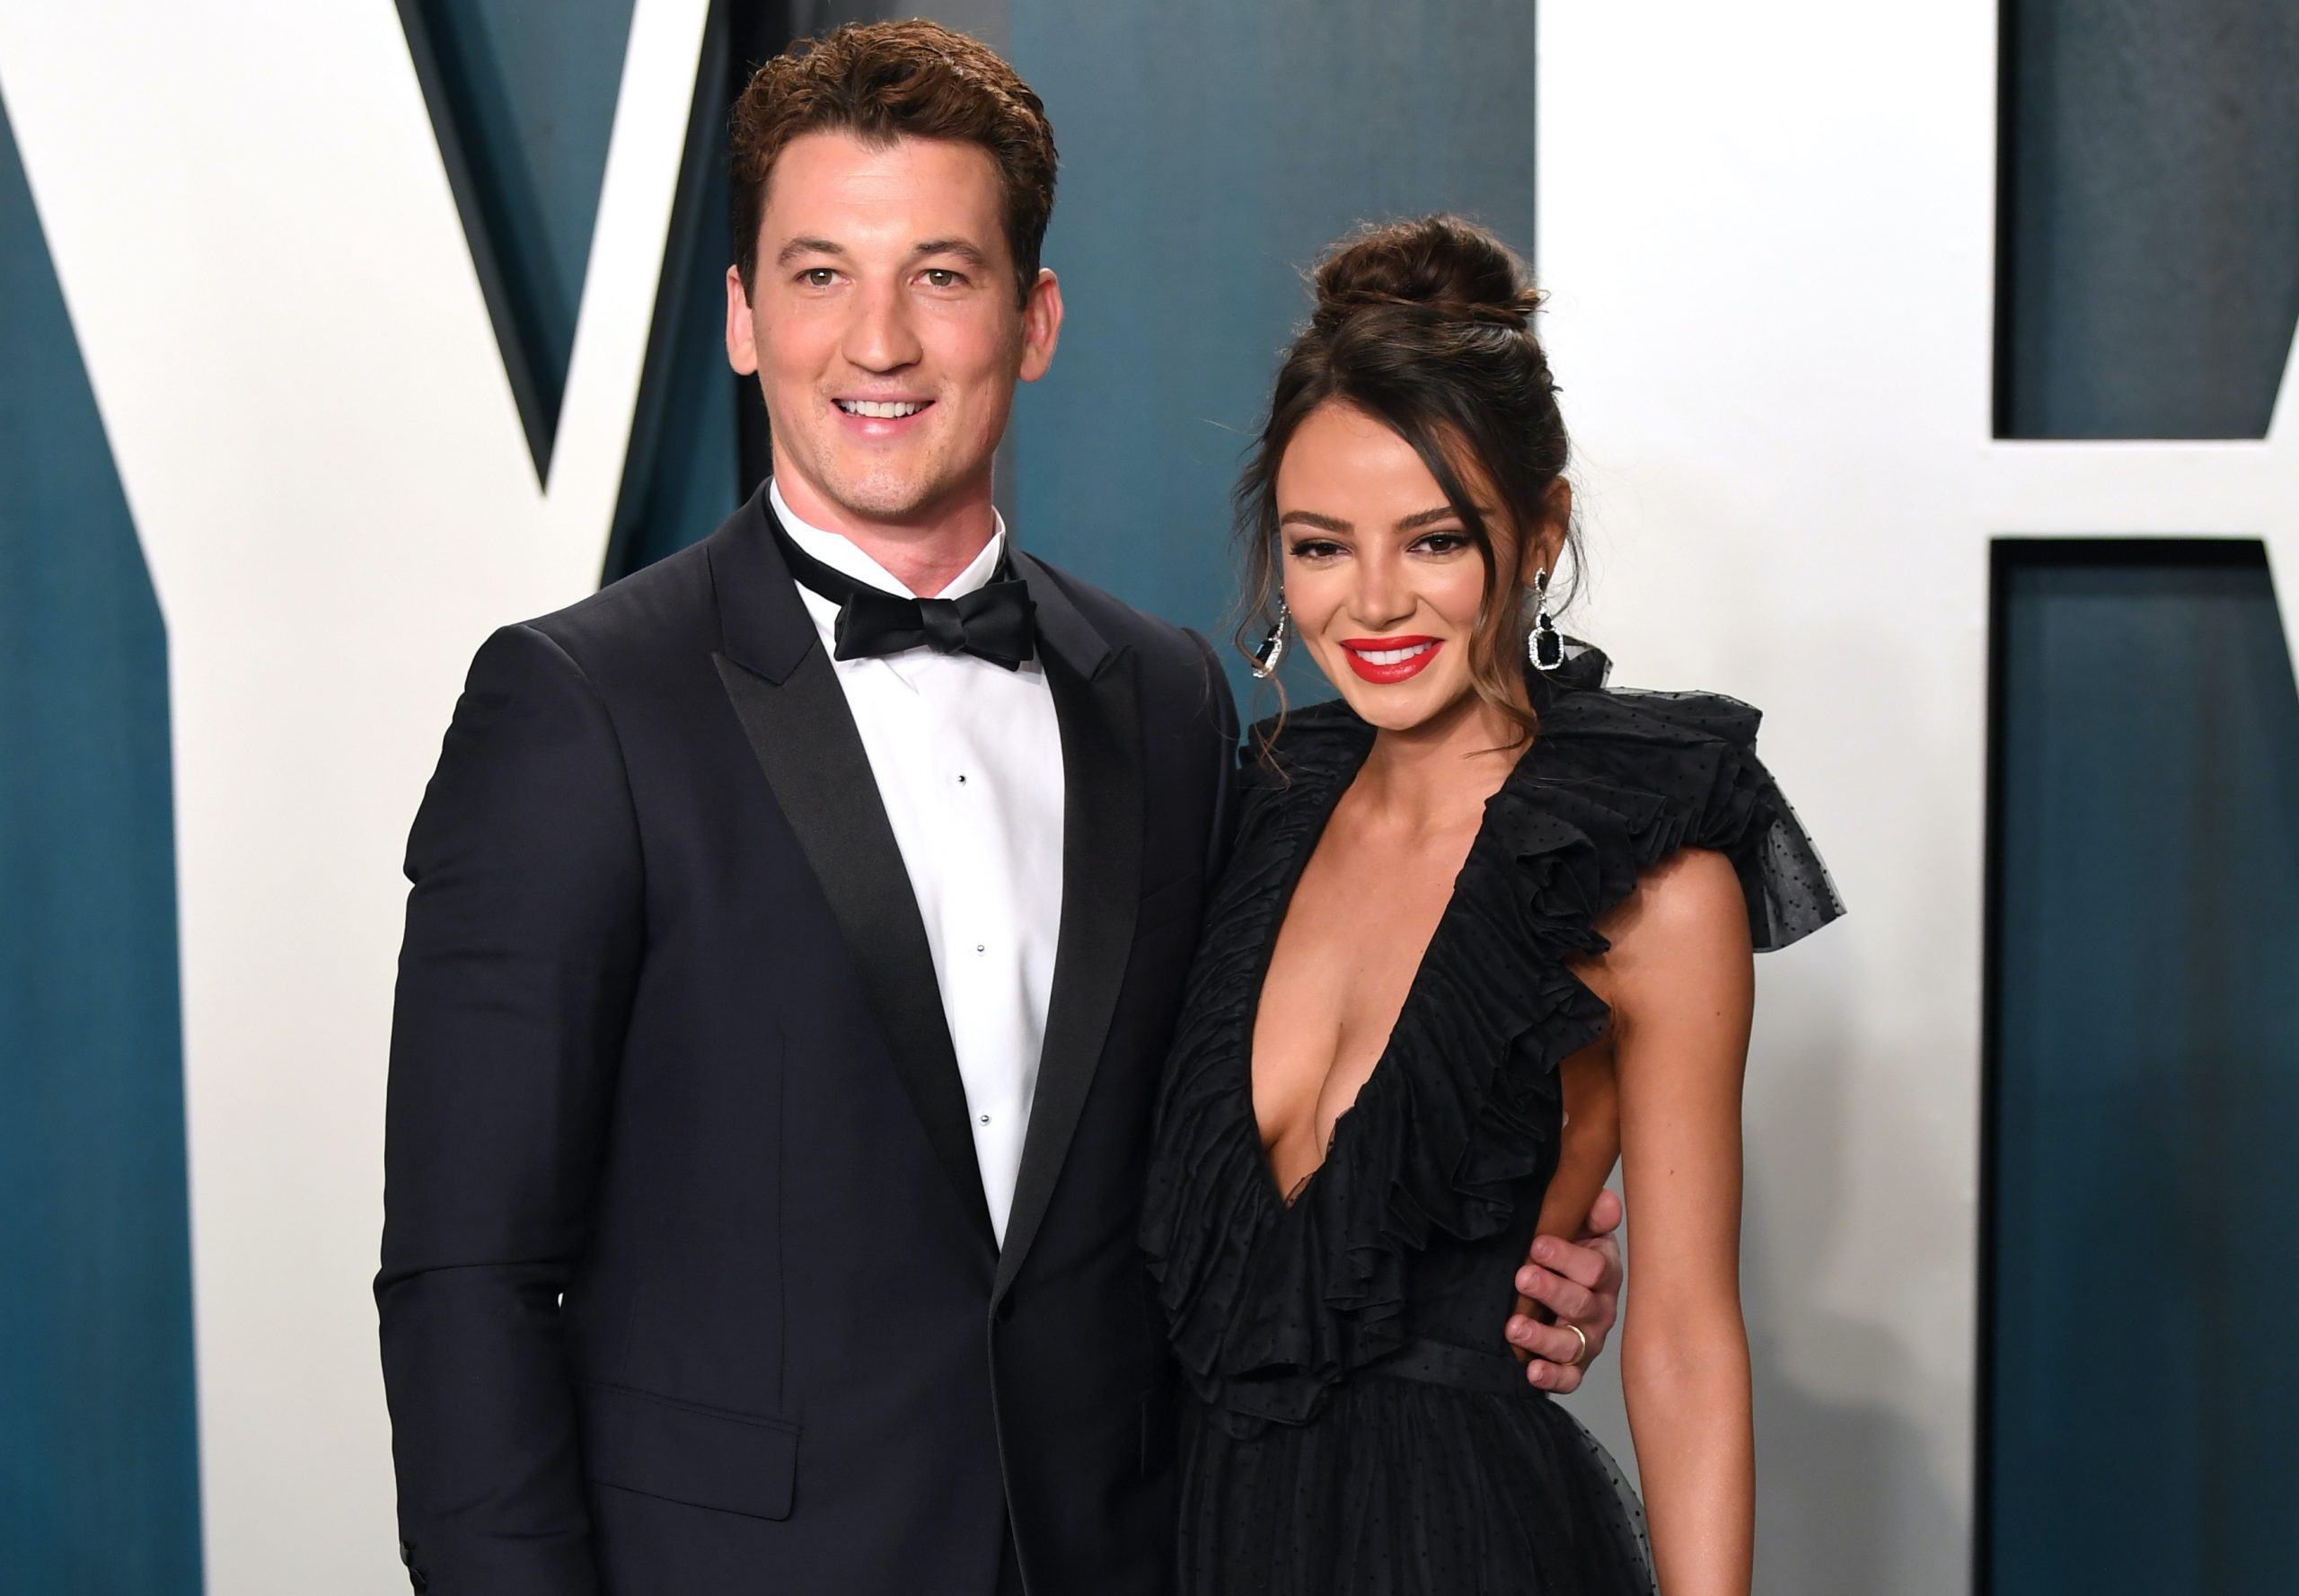 Vanity Fair Oscar Party Star Style Look of Miles Teller w/ Keleigh Sperry